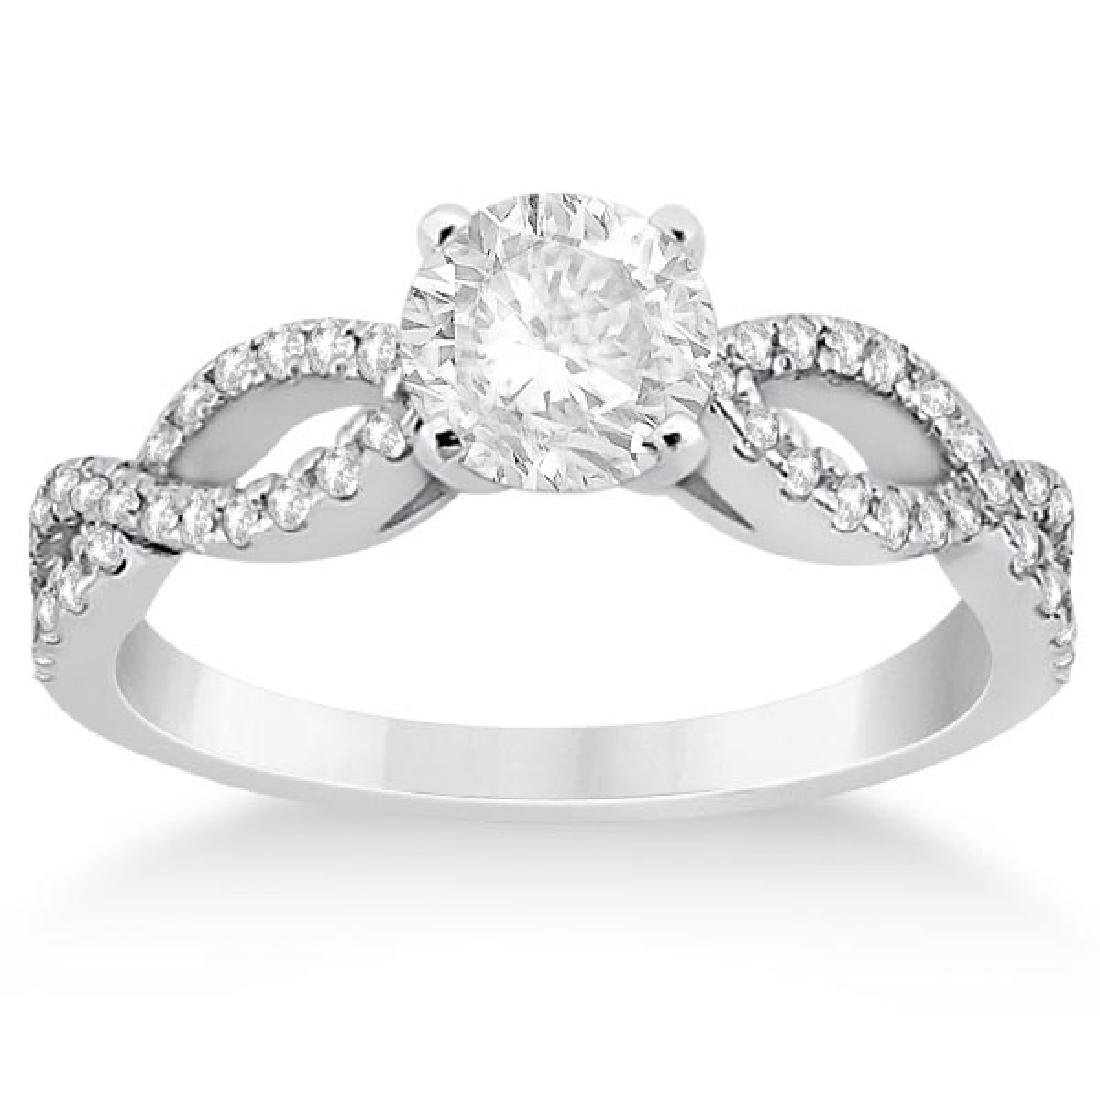 Diamond Twist Infinity Engagement Ring 14K White Gold